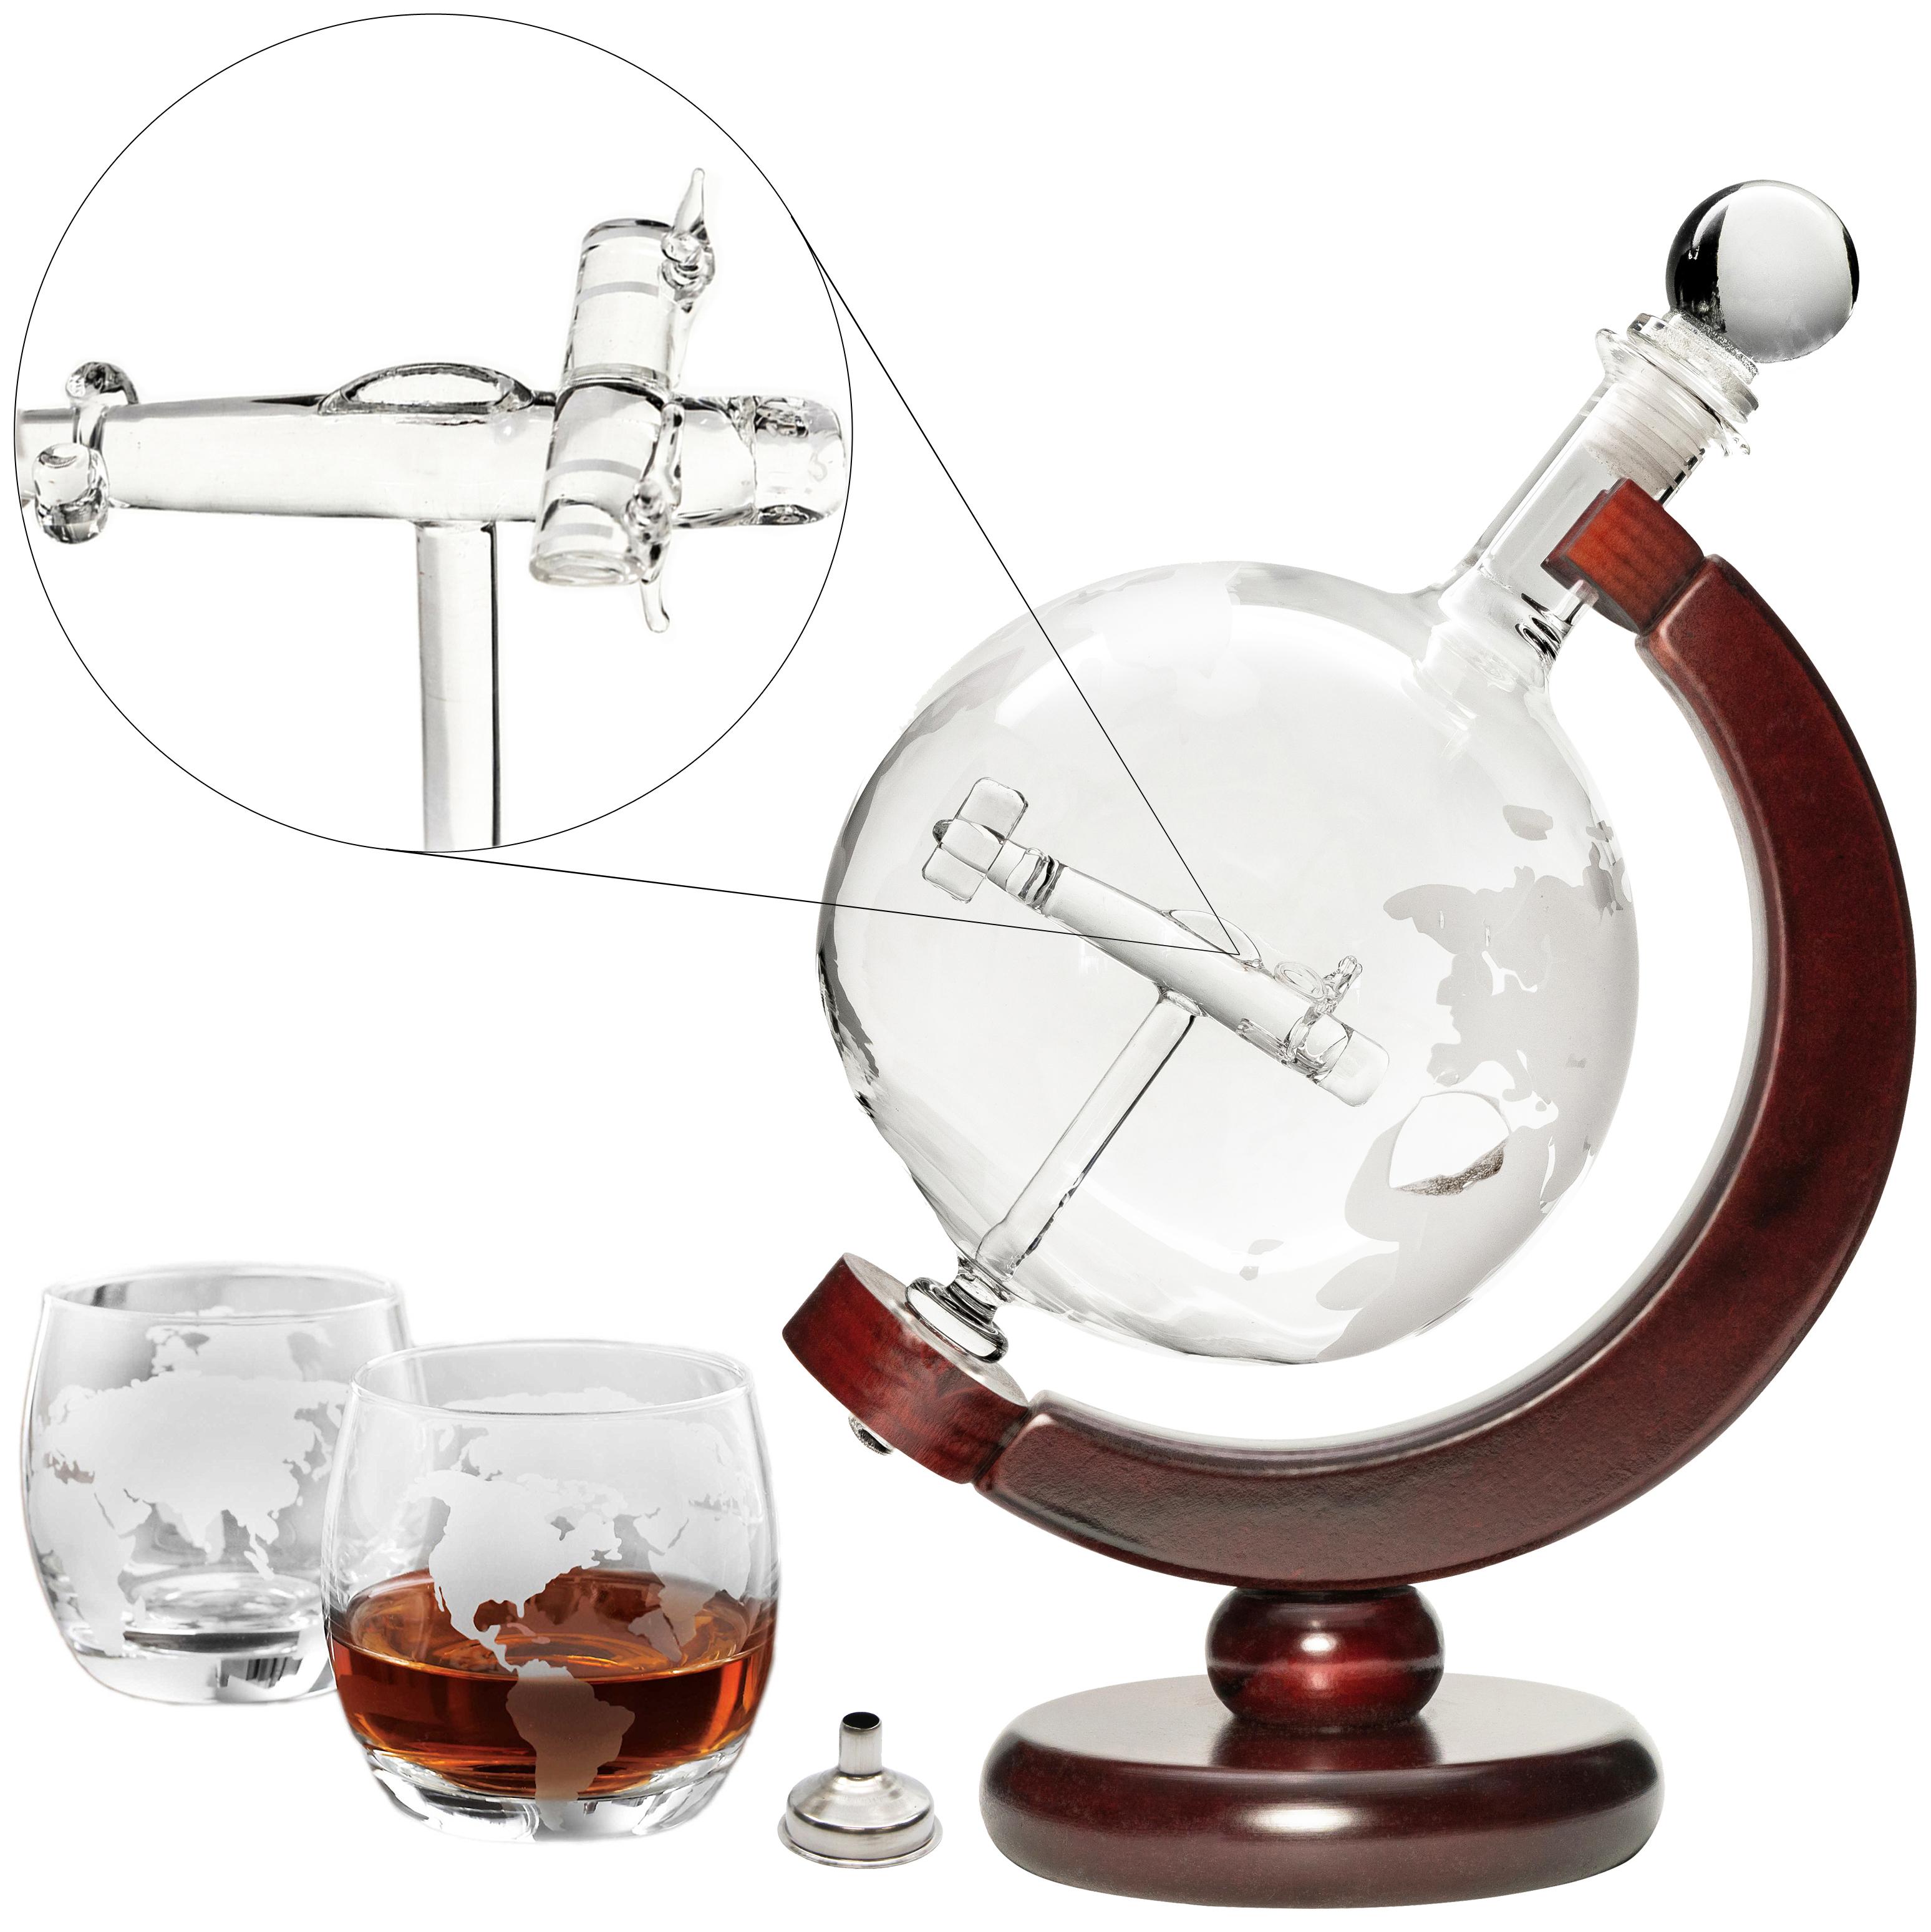 Denizli Spirits Large 50 Oz 'Plane' Handmade Whiskey Globe Decanter Set